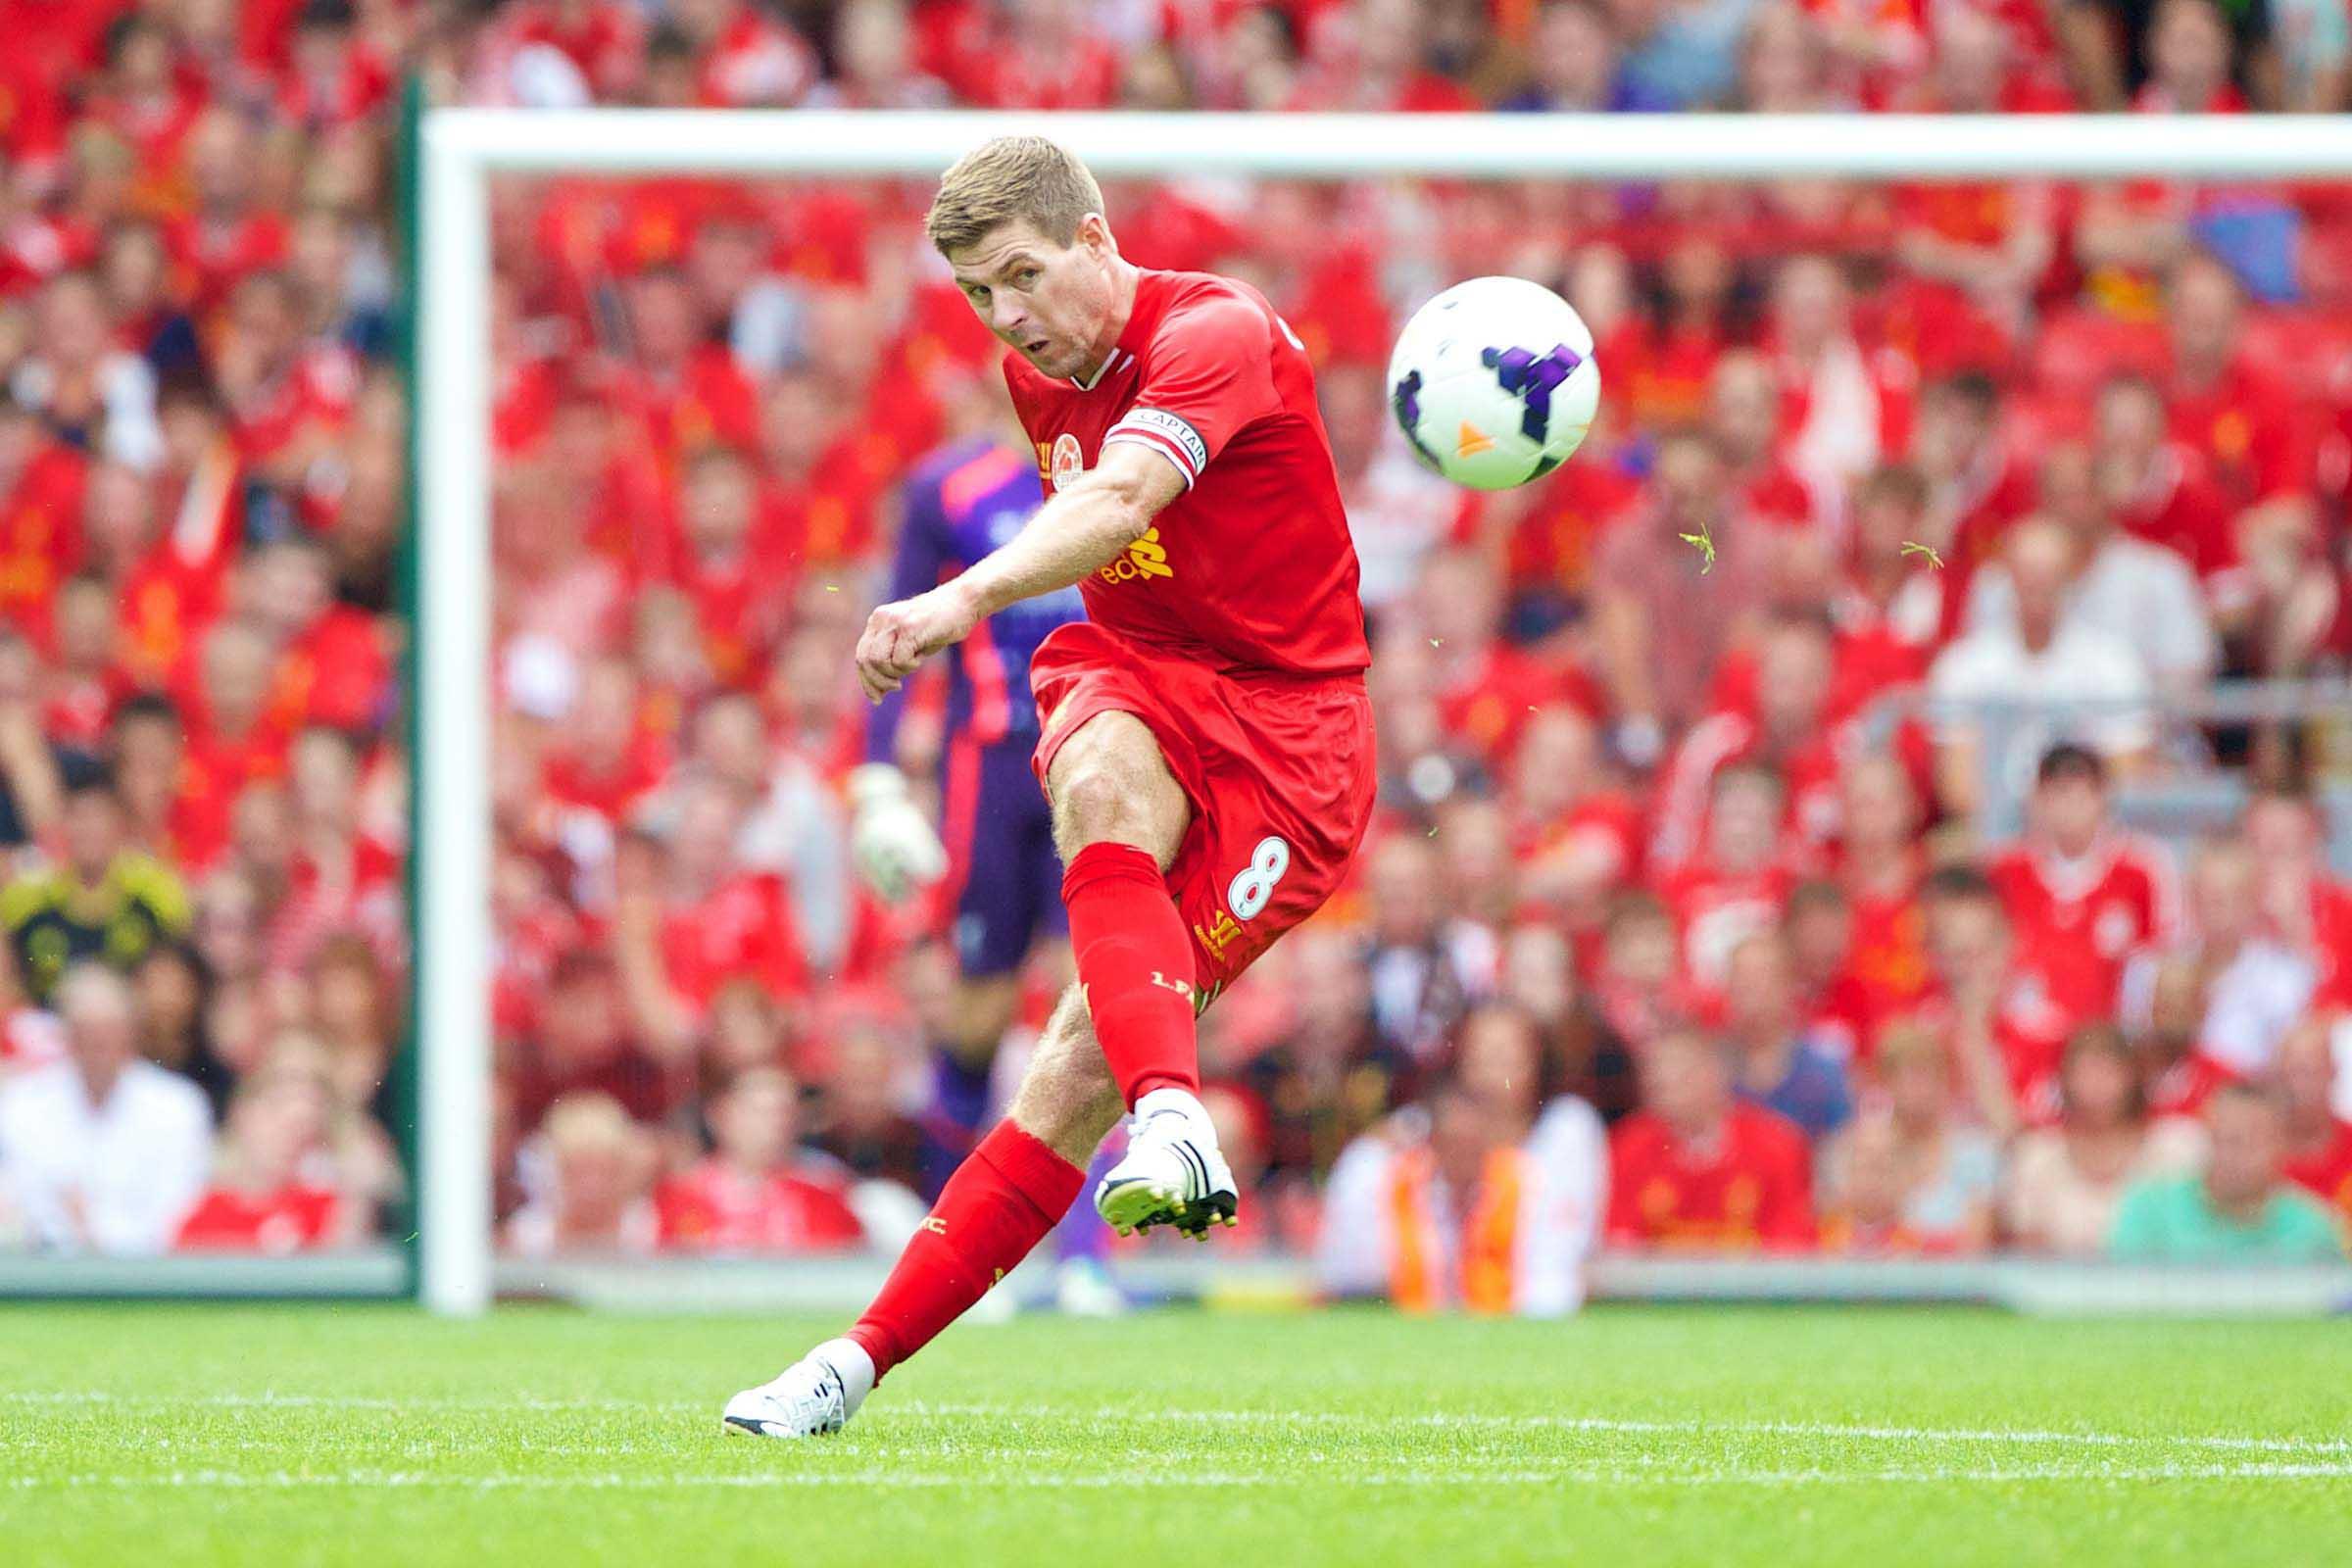 Football - Preseason Friendly - Liverpool FC v Olympiakos CFP